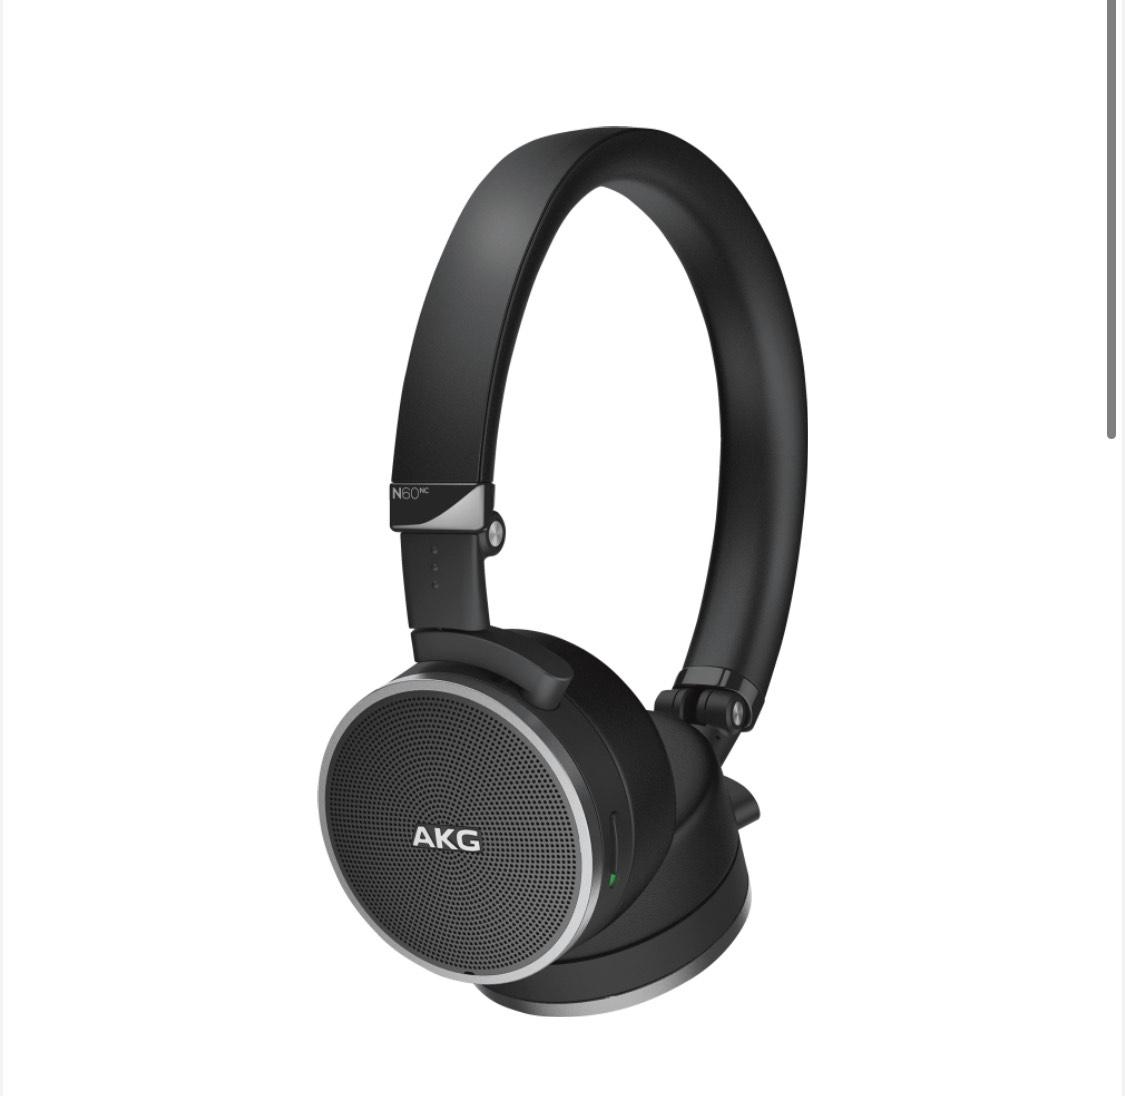 AKG N 60NC Bügelkopfhörer mit Noise Cancelling